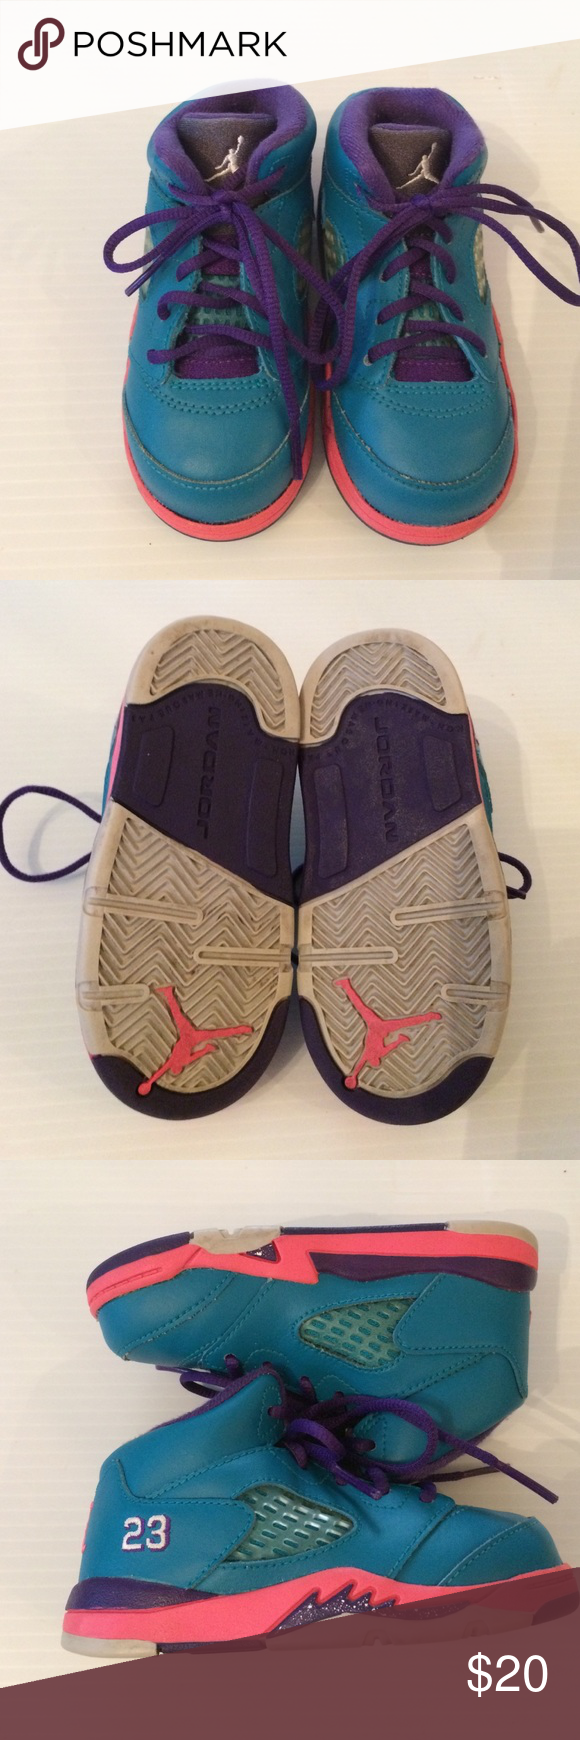 Jordan girls Toddler size 6 Preowned girls size 6C good conditions Jordan Jordan Shoes Sneakers